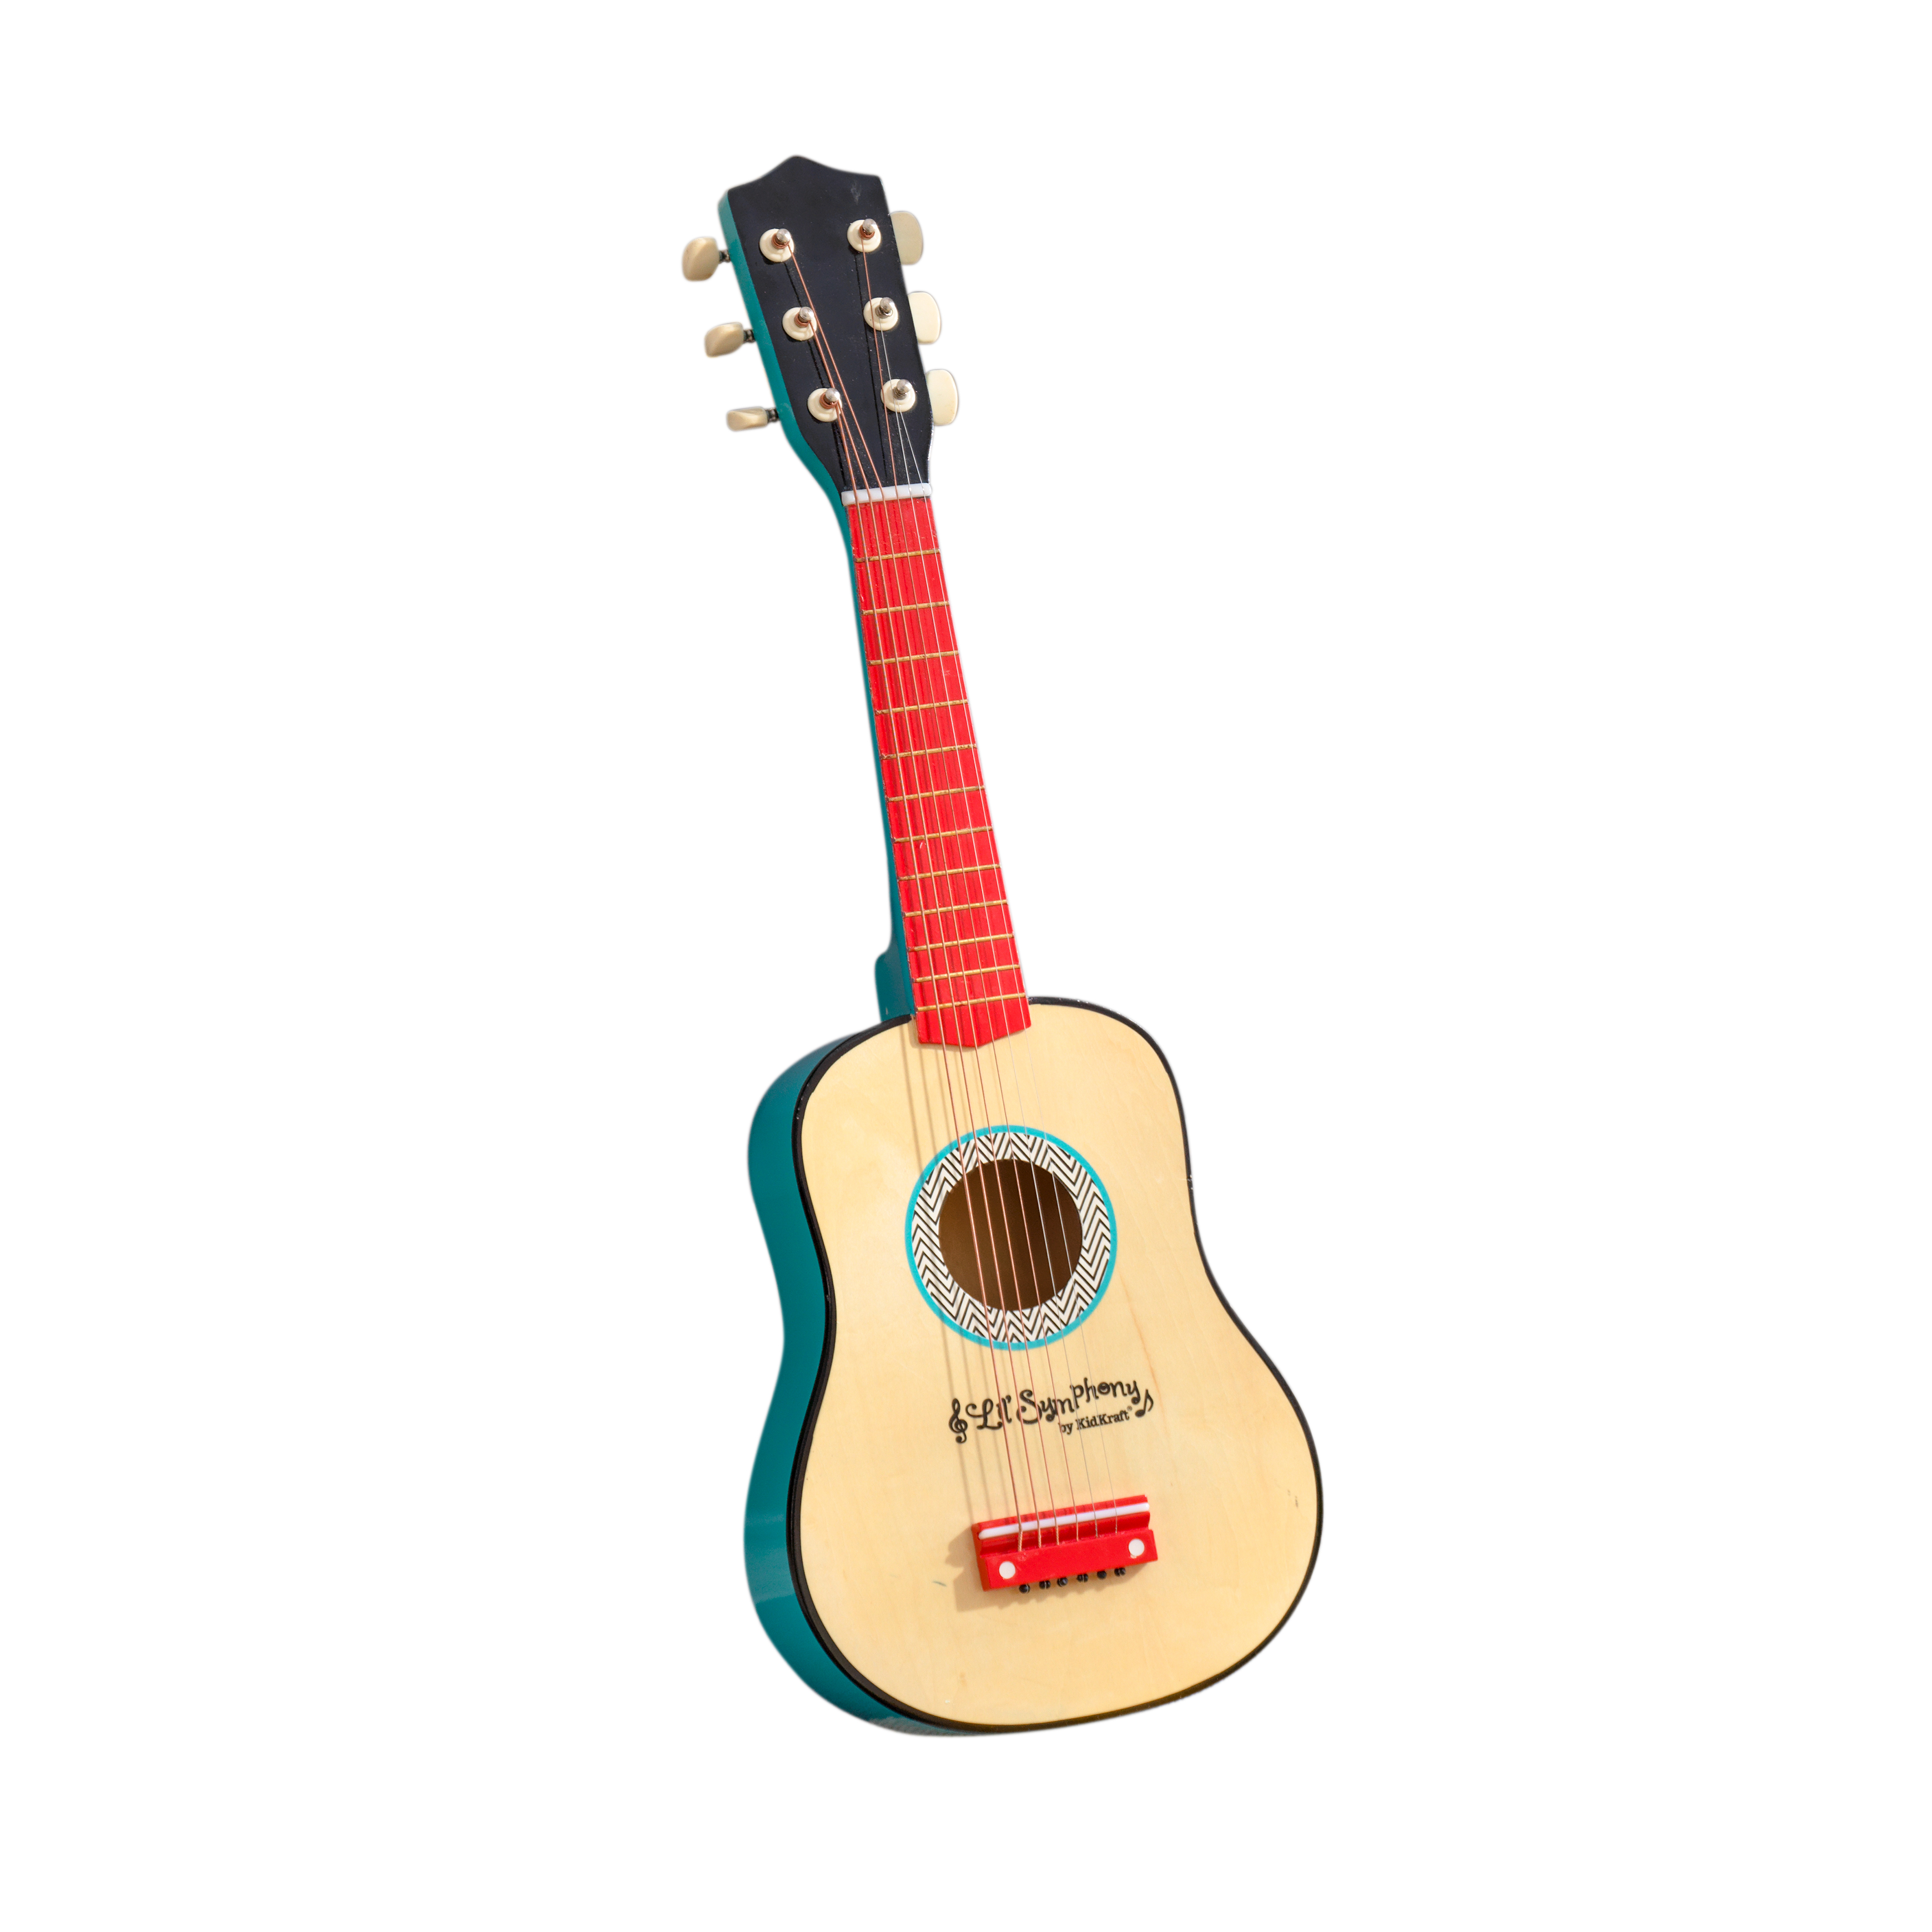 kidkraft lil' symphony wooden play guitar, kids musical